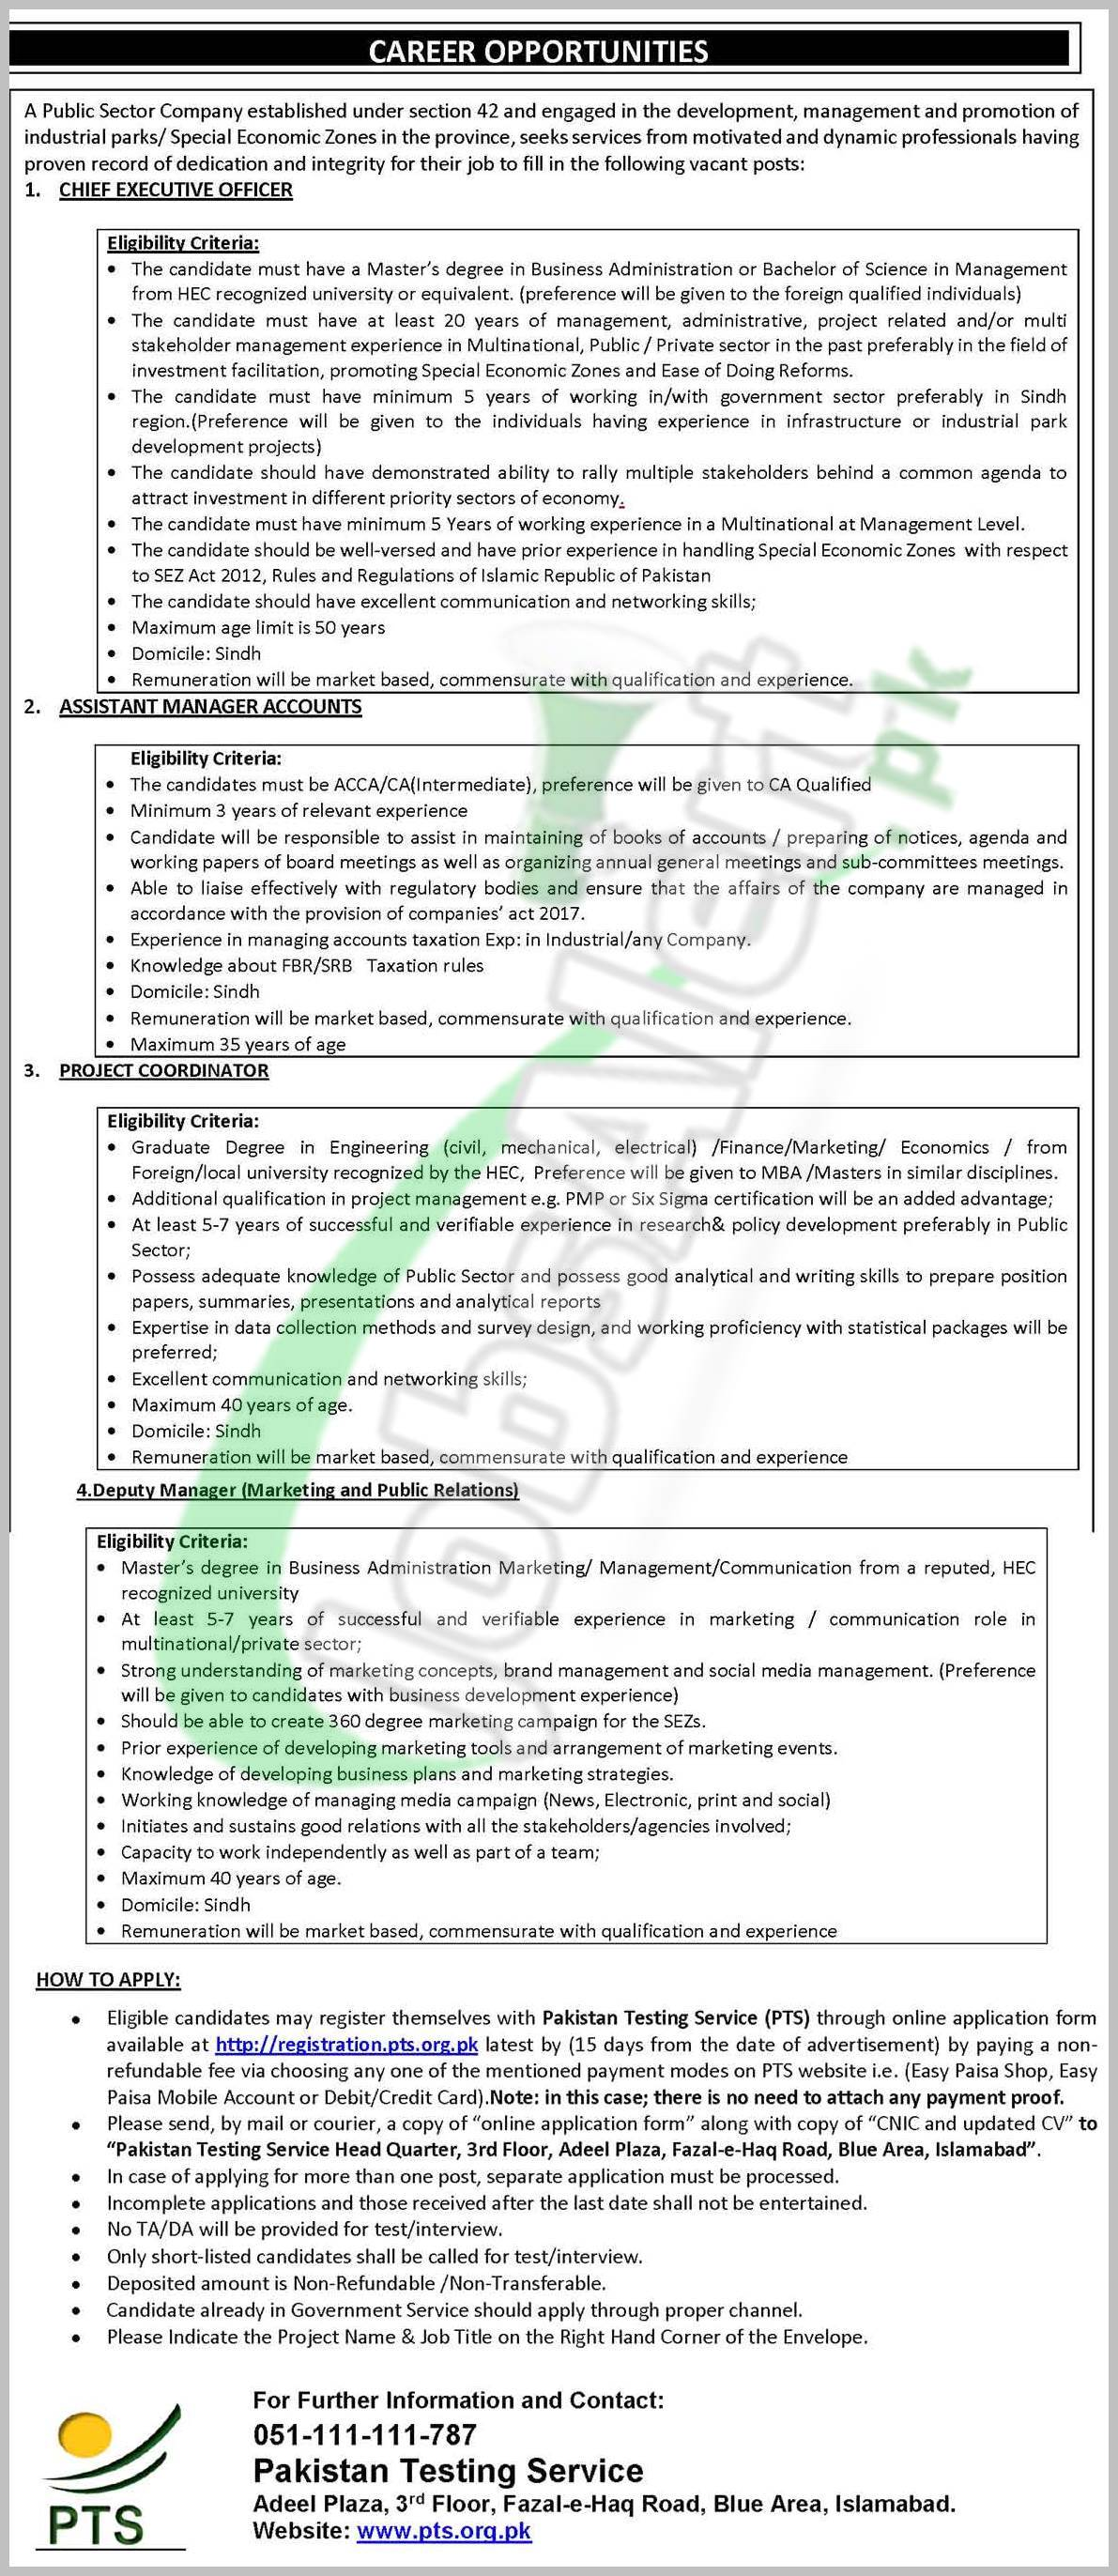 Public Sector Company Sindh Jobs 2018